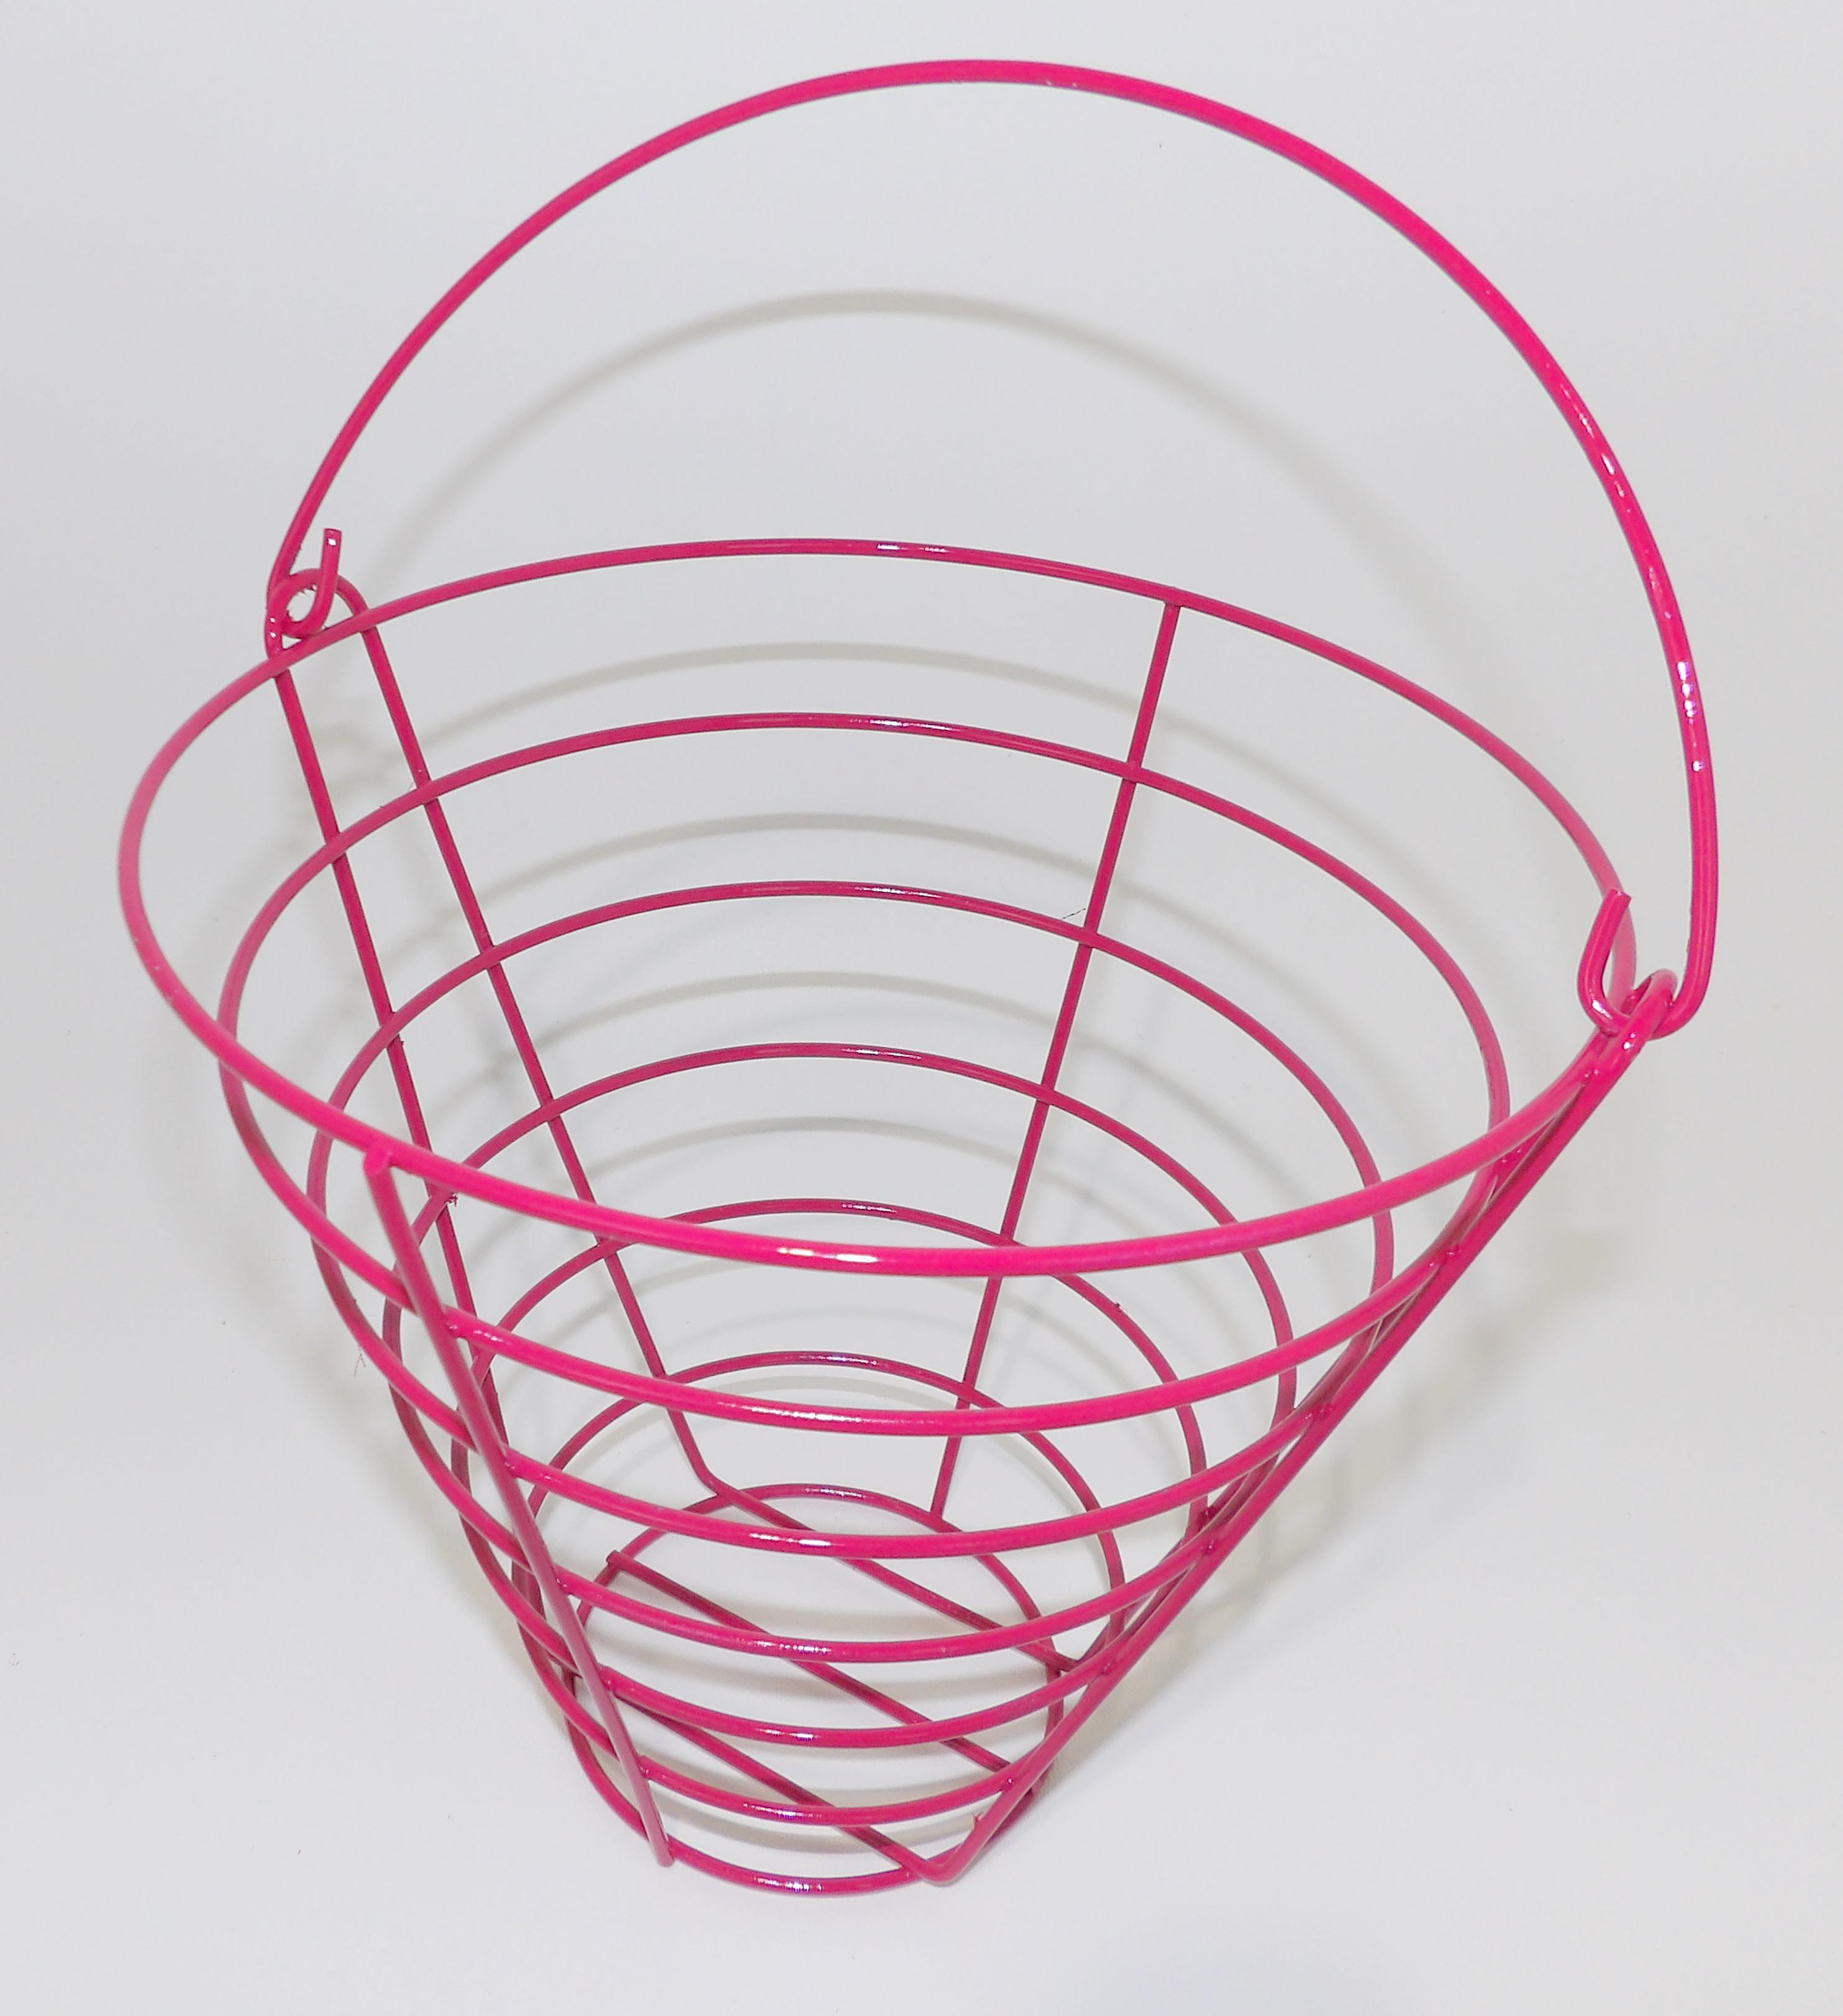 Pink Wire Egg Baskets - Wiring Info •